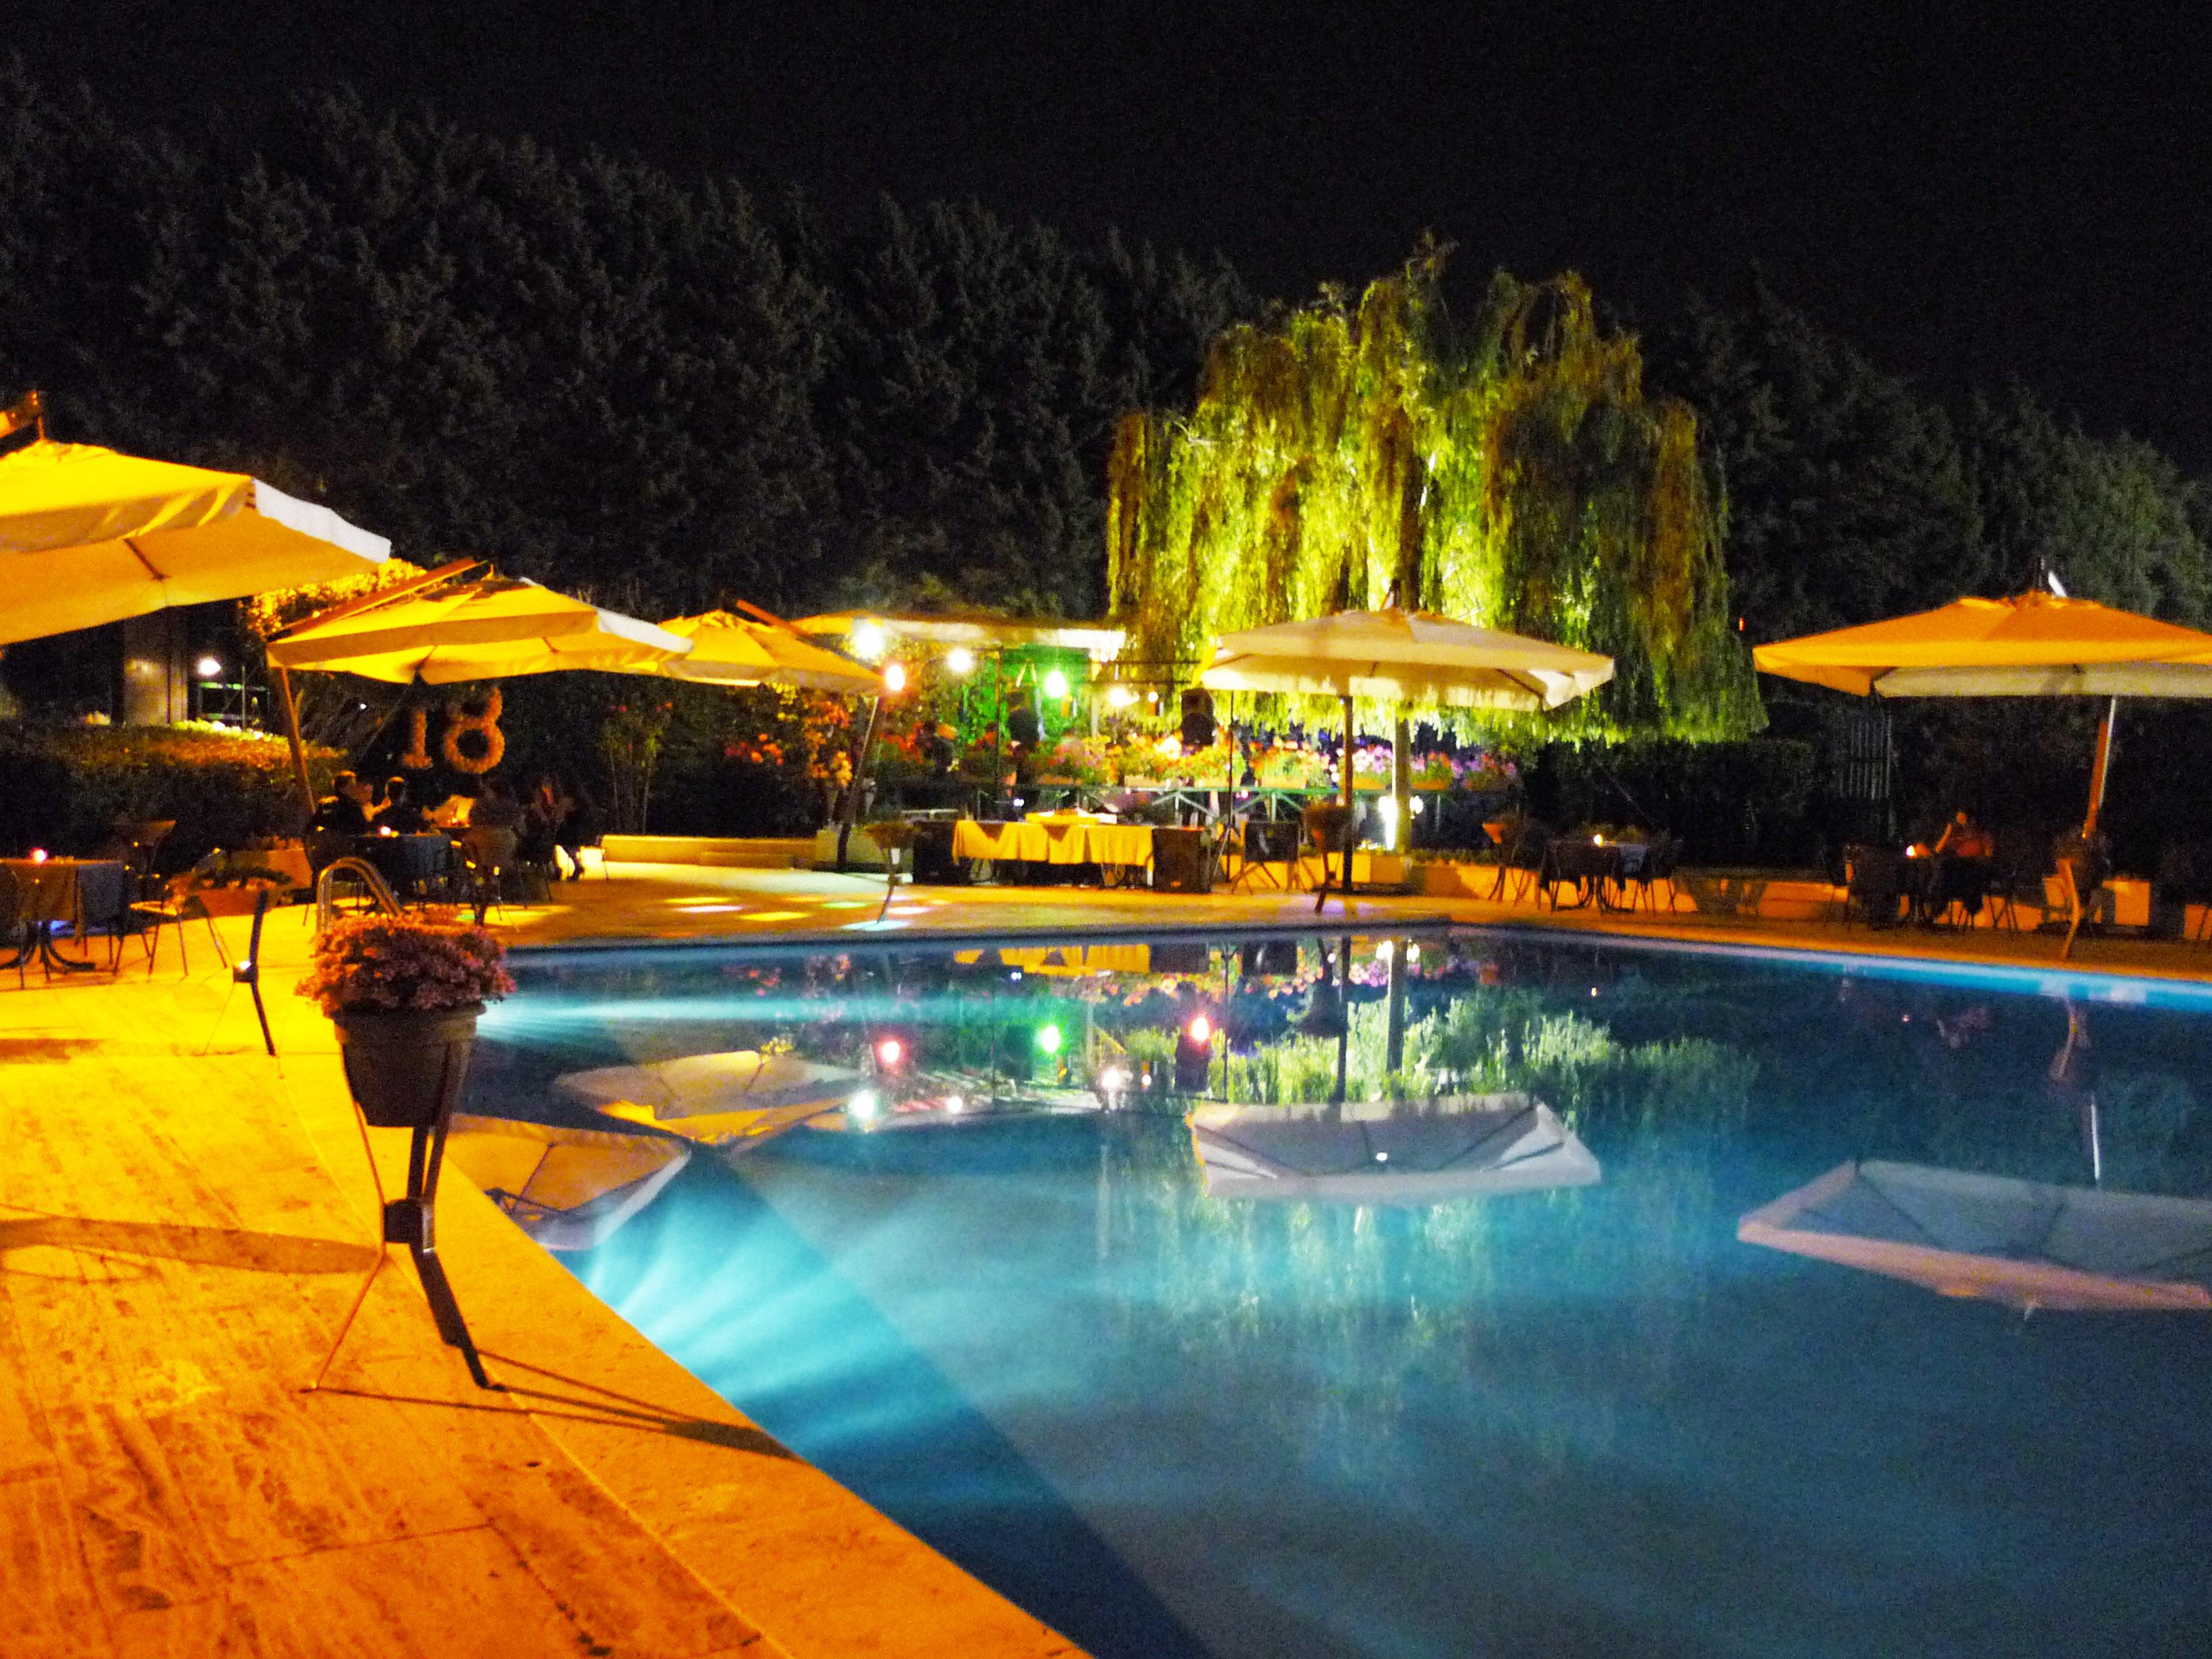 Foto gallery piscina cocktail bar e ristorante - Piscina eur roma ...